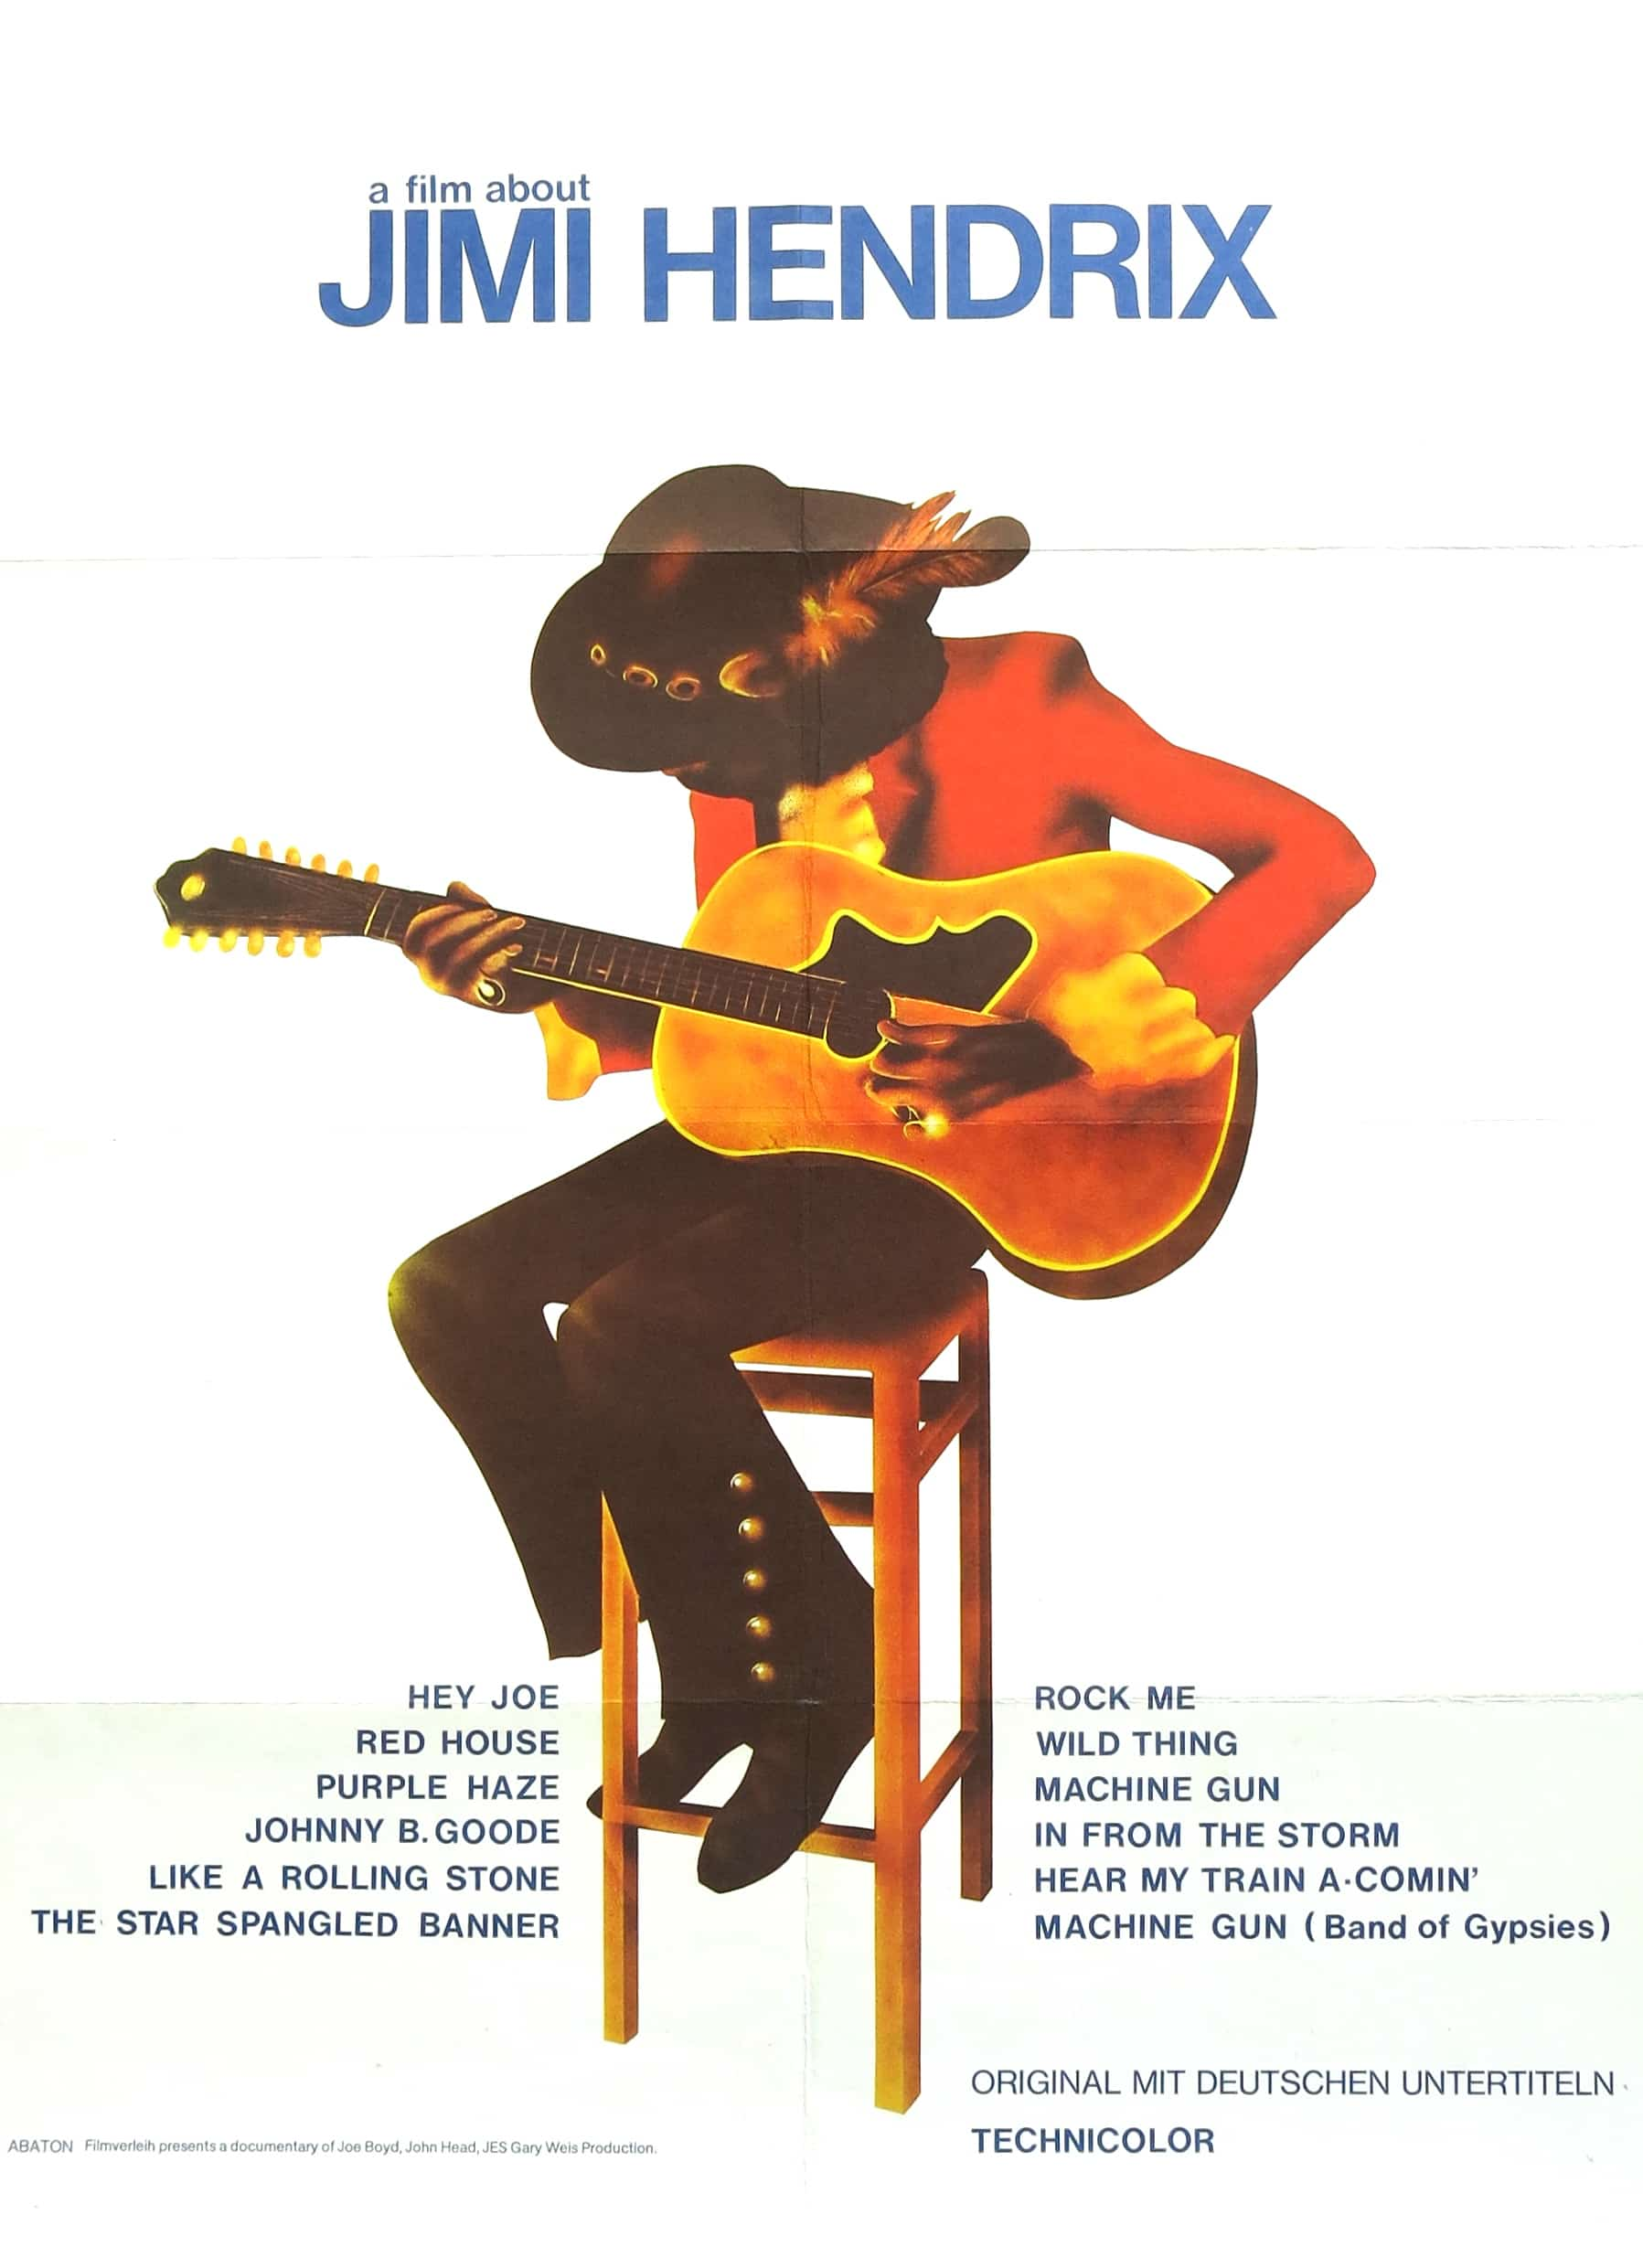 jimi hendrix 1973 poster for a film about jimi hendrix. Black Bedroom Furniture Sets. Home Design Ideas